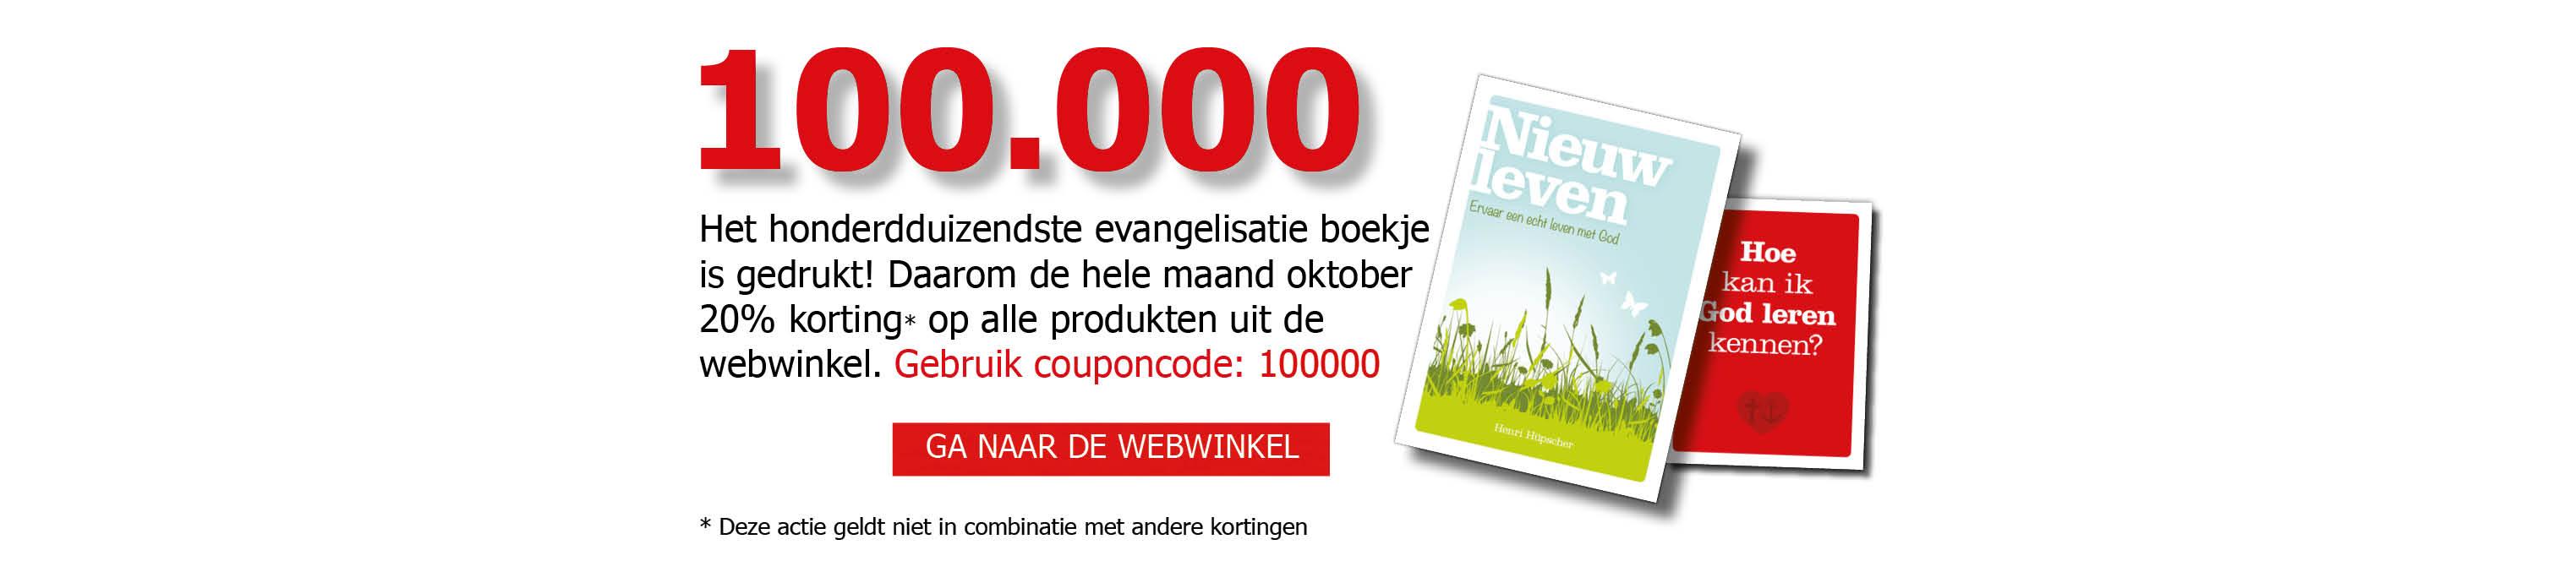 winkel100000